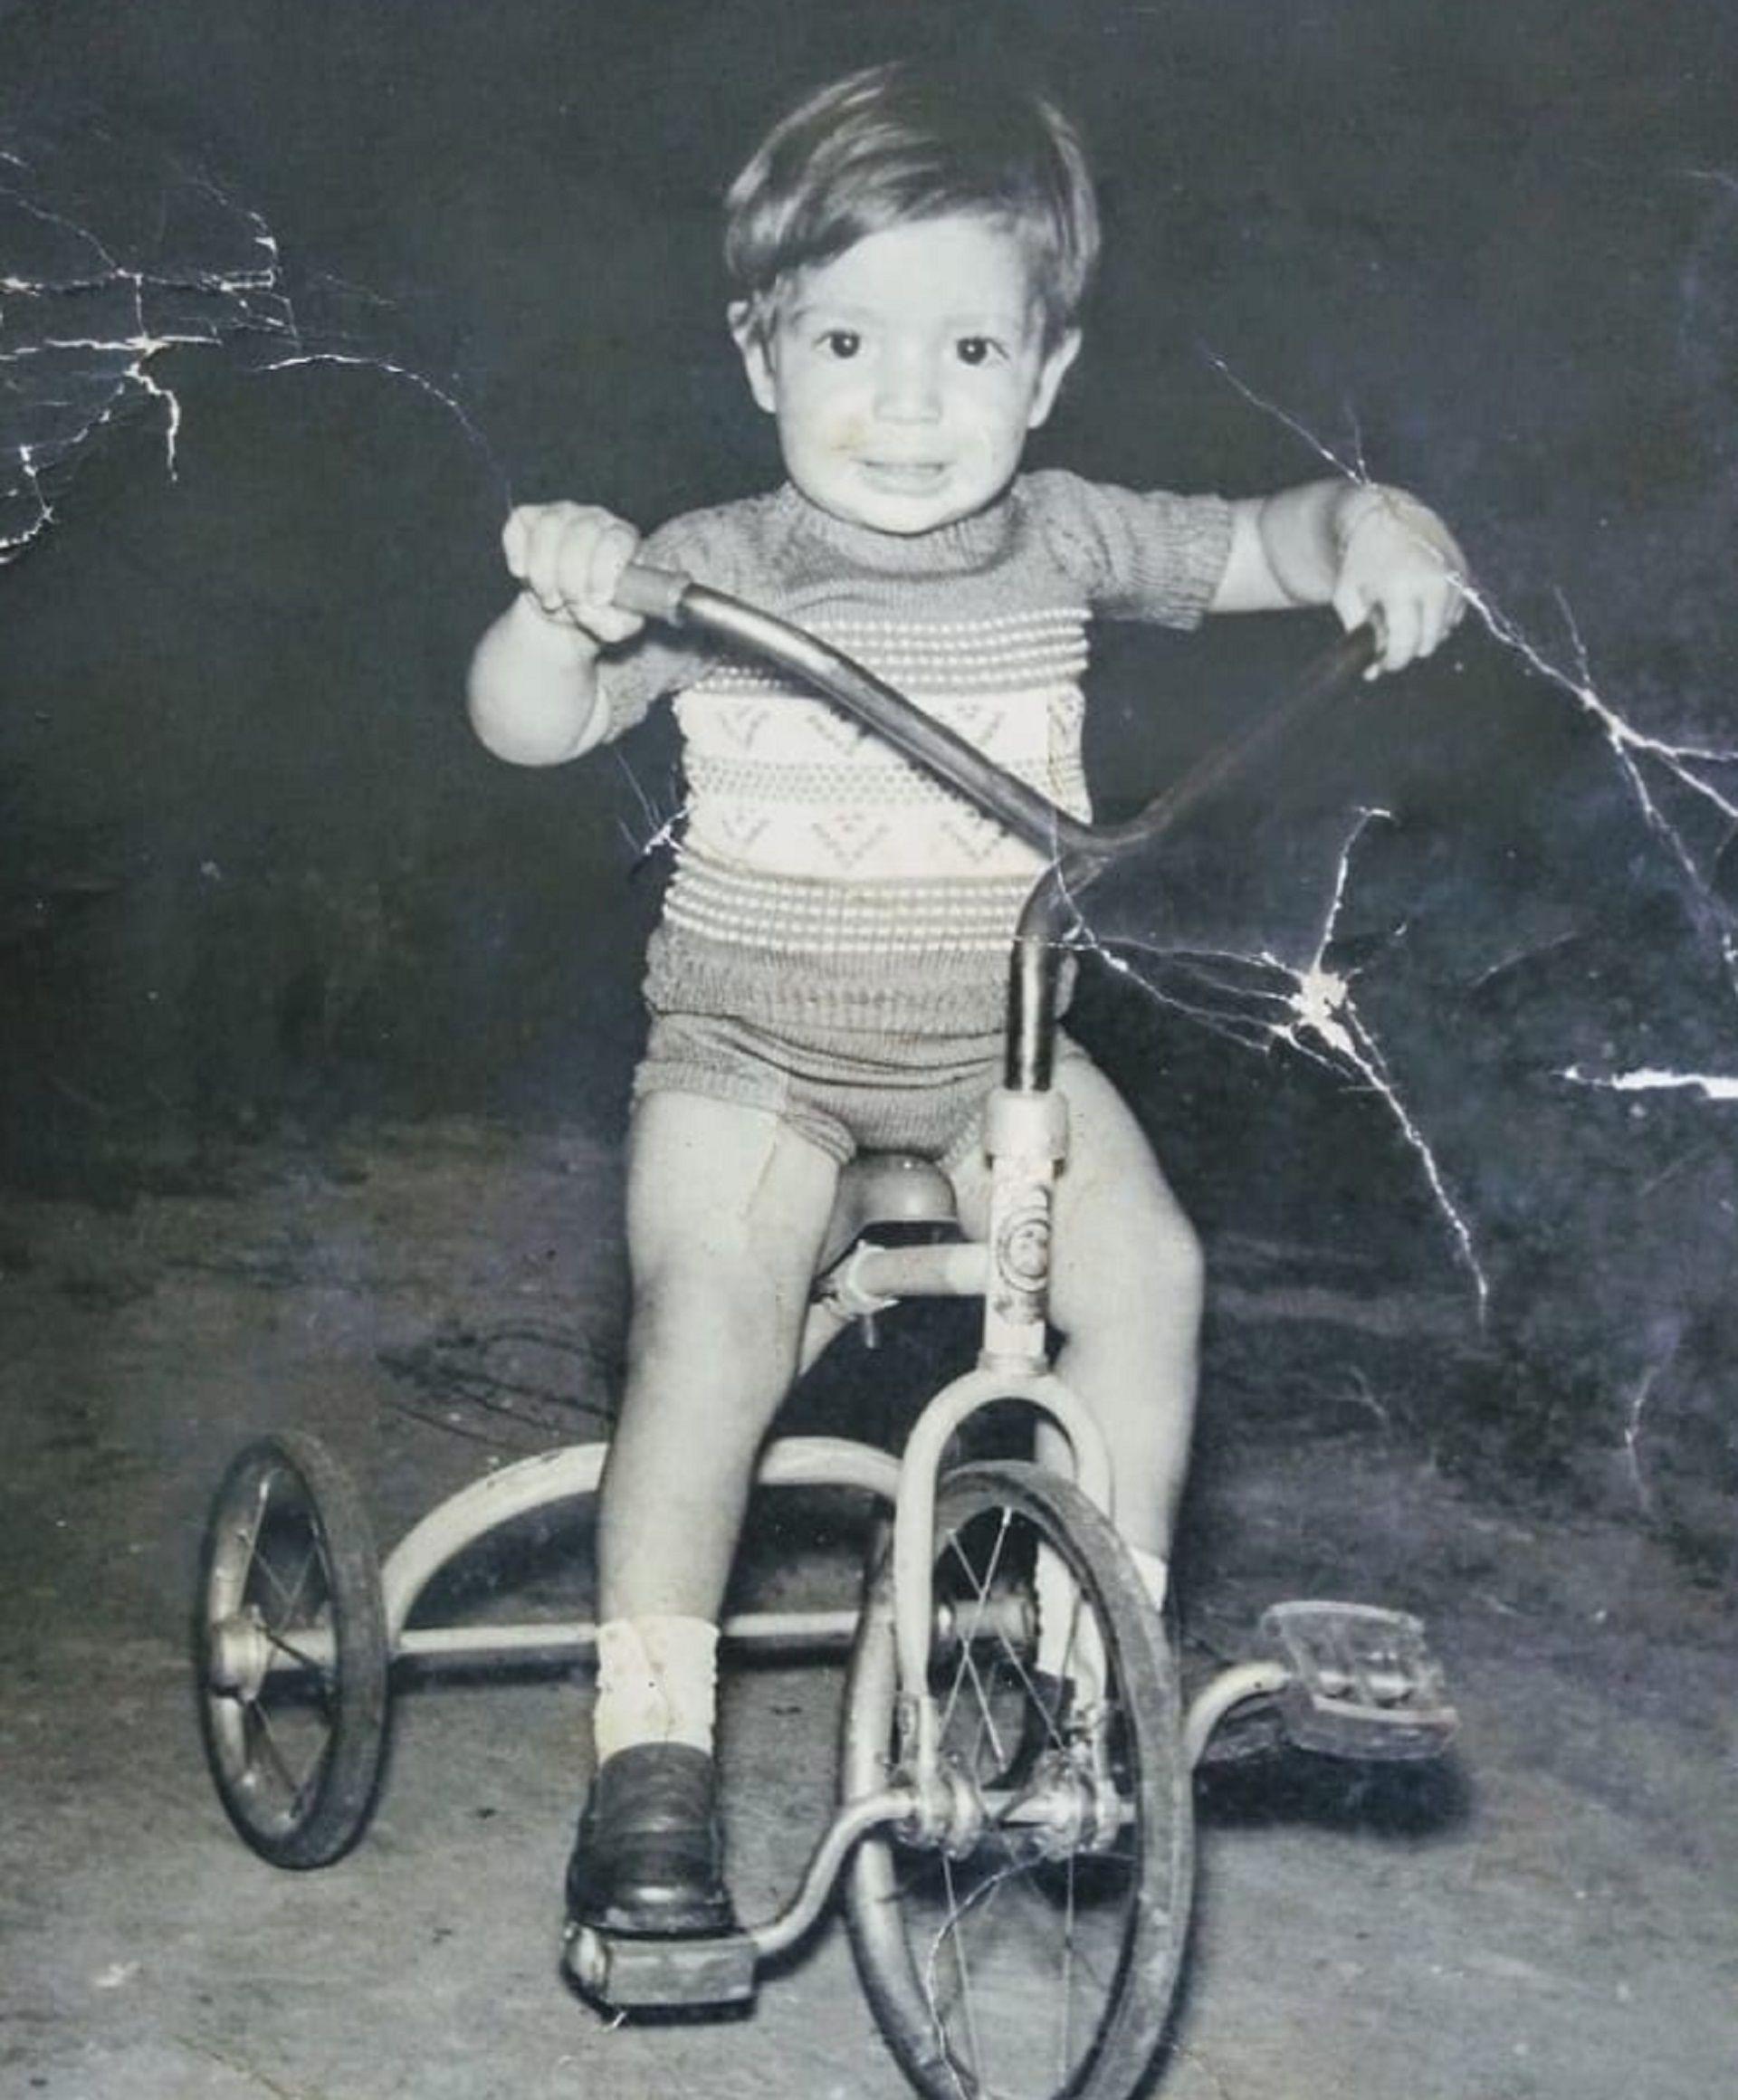 La foto que compartió Lizy Tagliani de su infancia